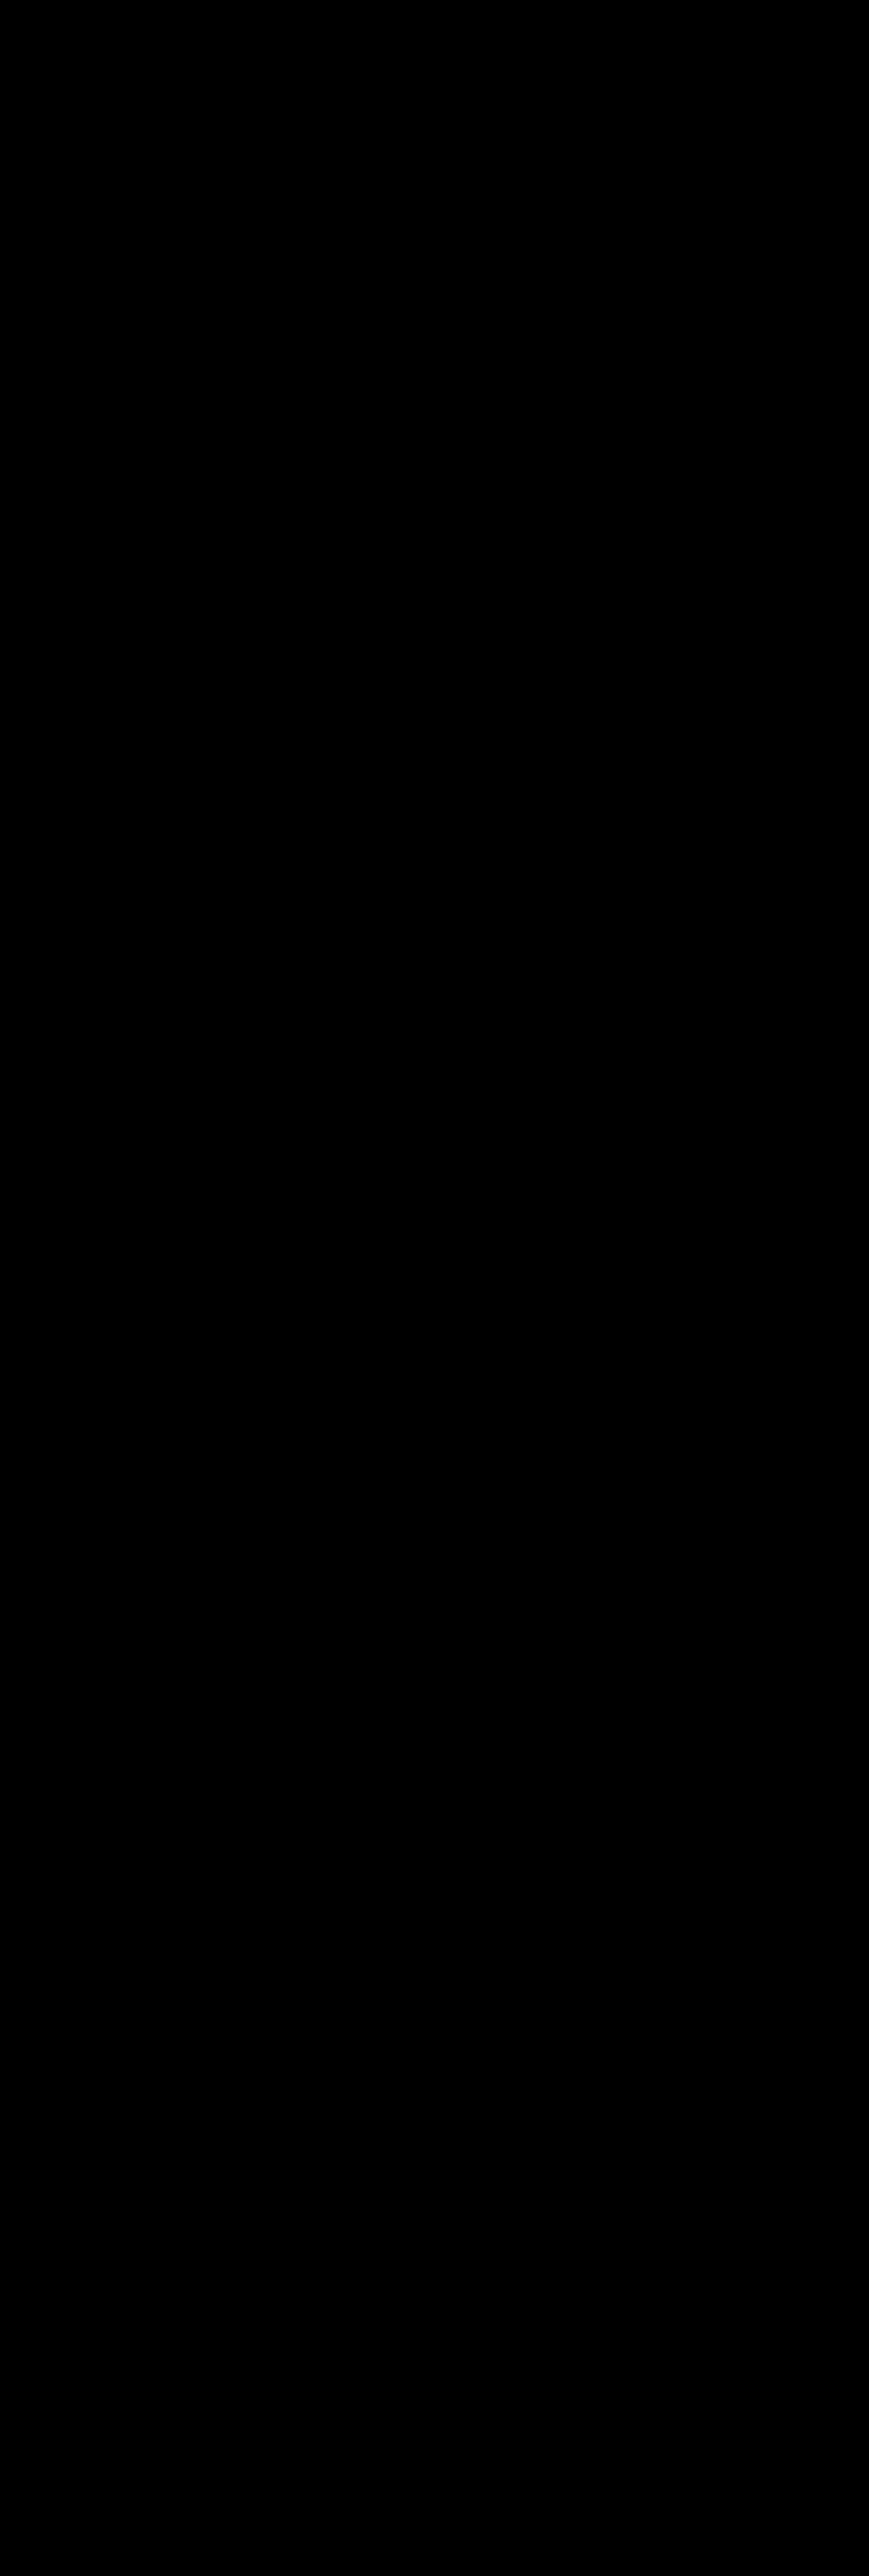 Little Wren Farm logo